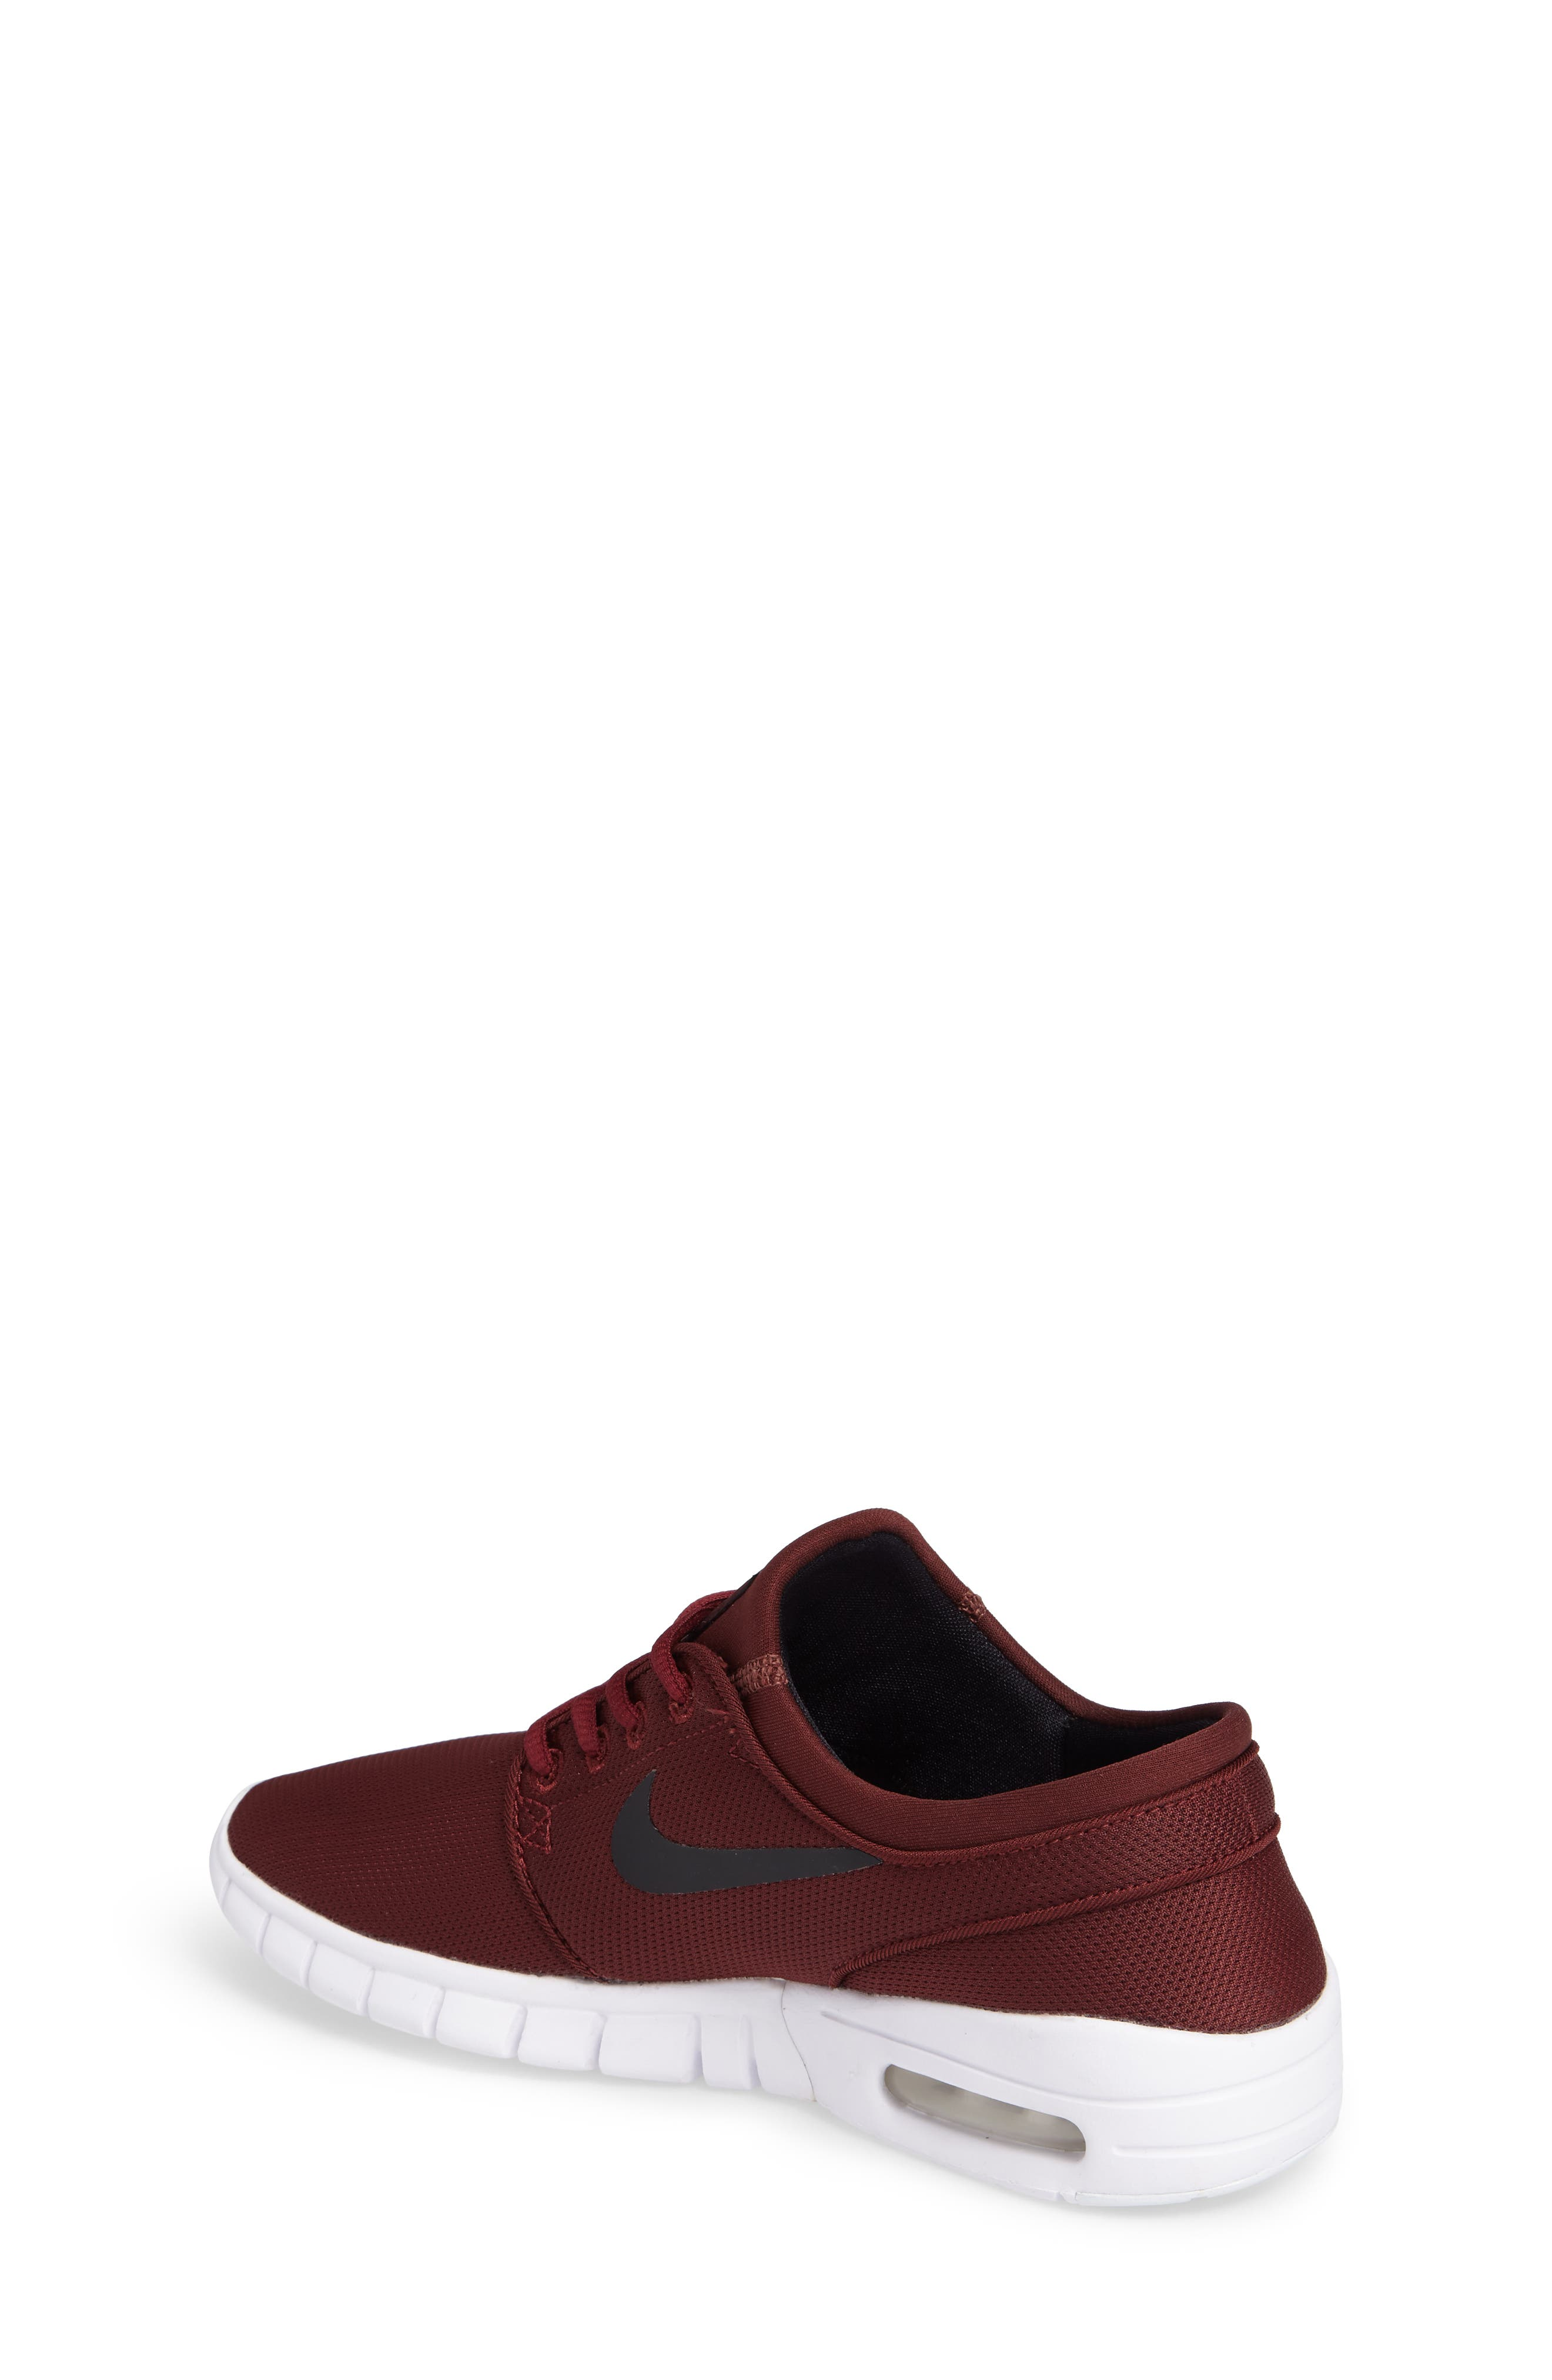 Stefan Janoski Max SB Skate Sneaker,                             Alternate thumbnail 18, color,